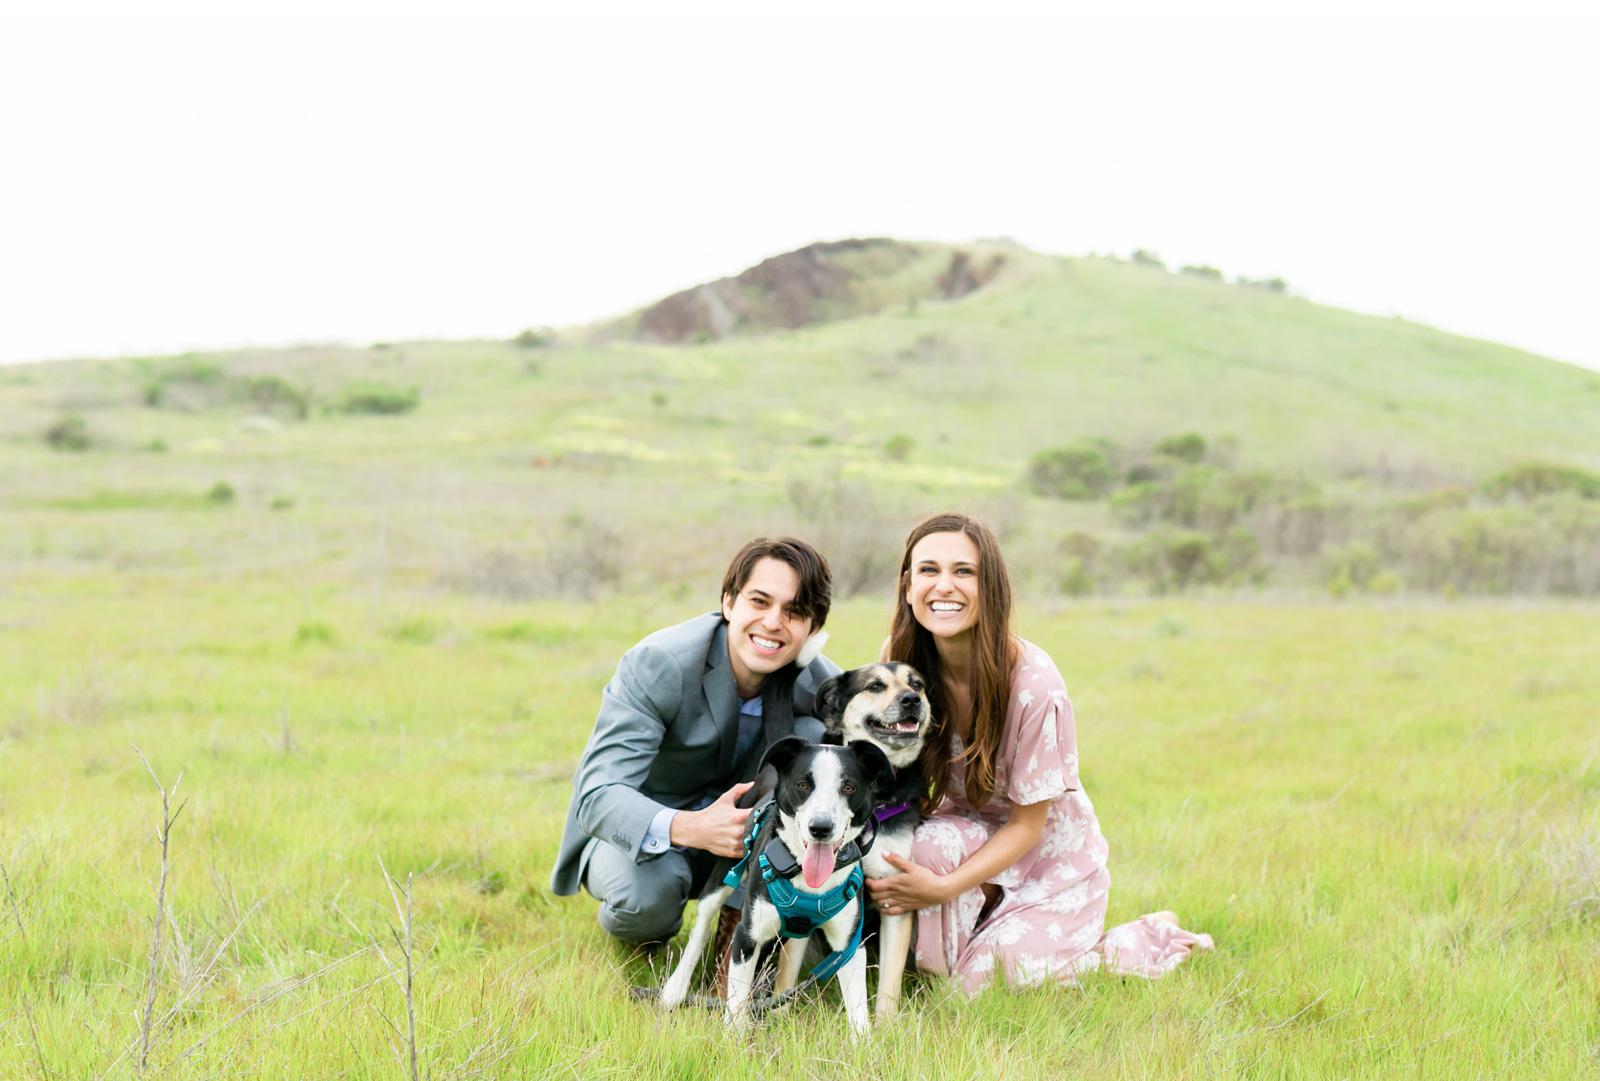 San-Luis-Obispo-Wedding-Green-Hills-Natalie-Schutt-Photography_12.jpg